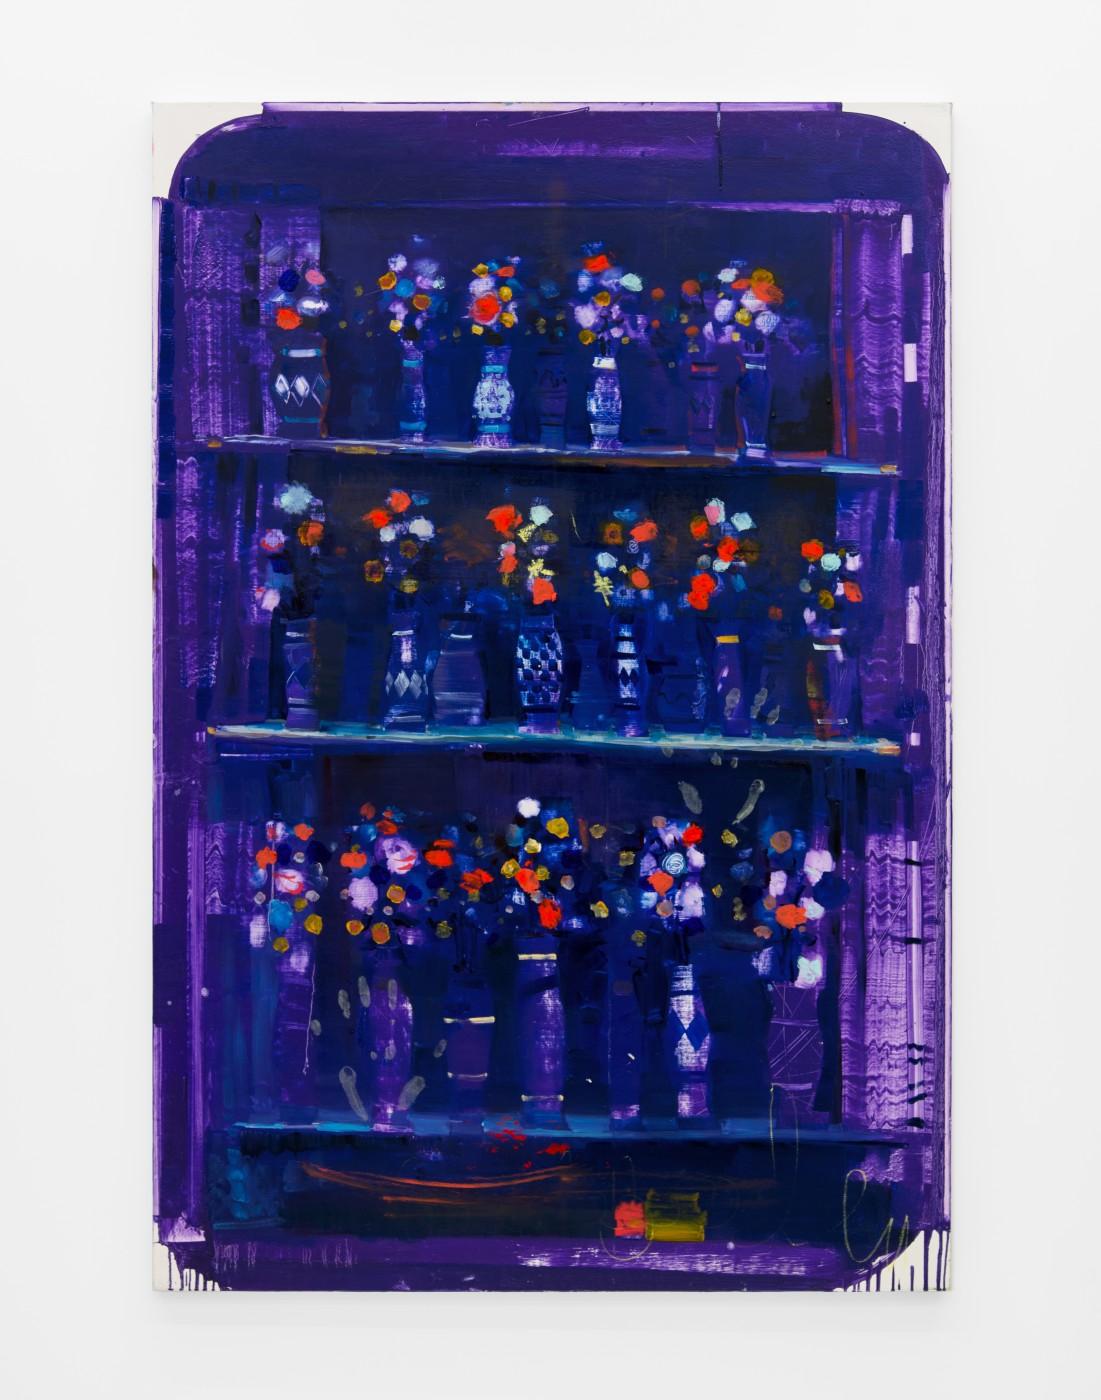 WALLFLOWERS, MALFLOWERS  Provence Bluish Flowers #2 , 2018   Oil on canvas  152,4 × 101,6 cm / 60 × 40 in  Nathan Zeidman